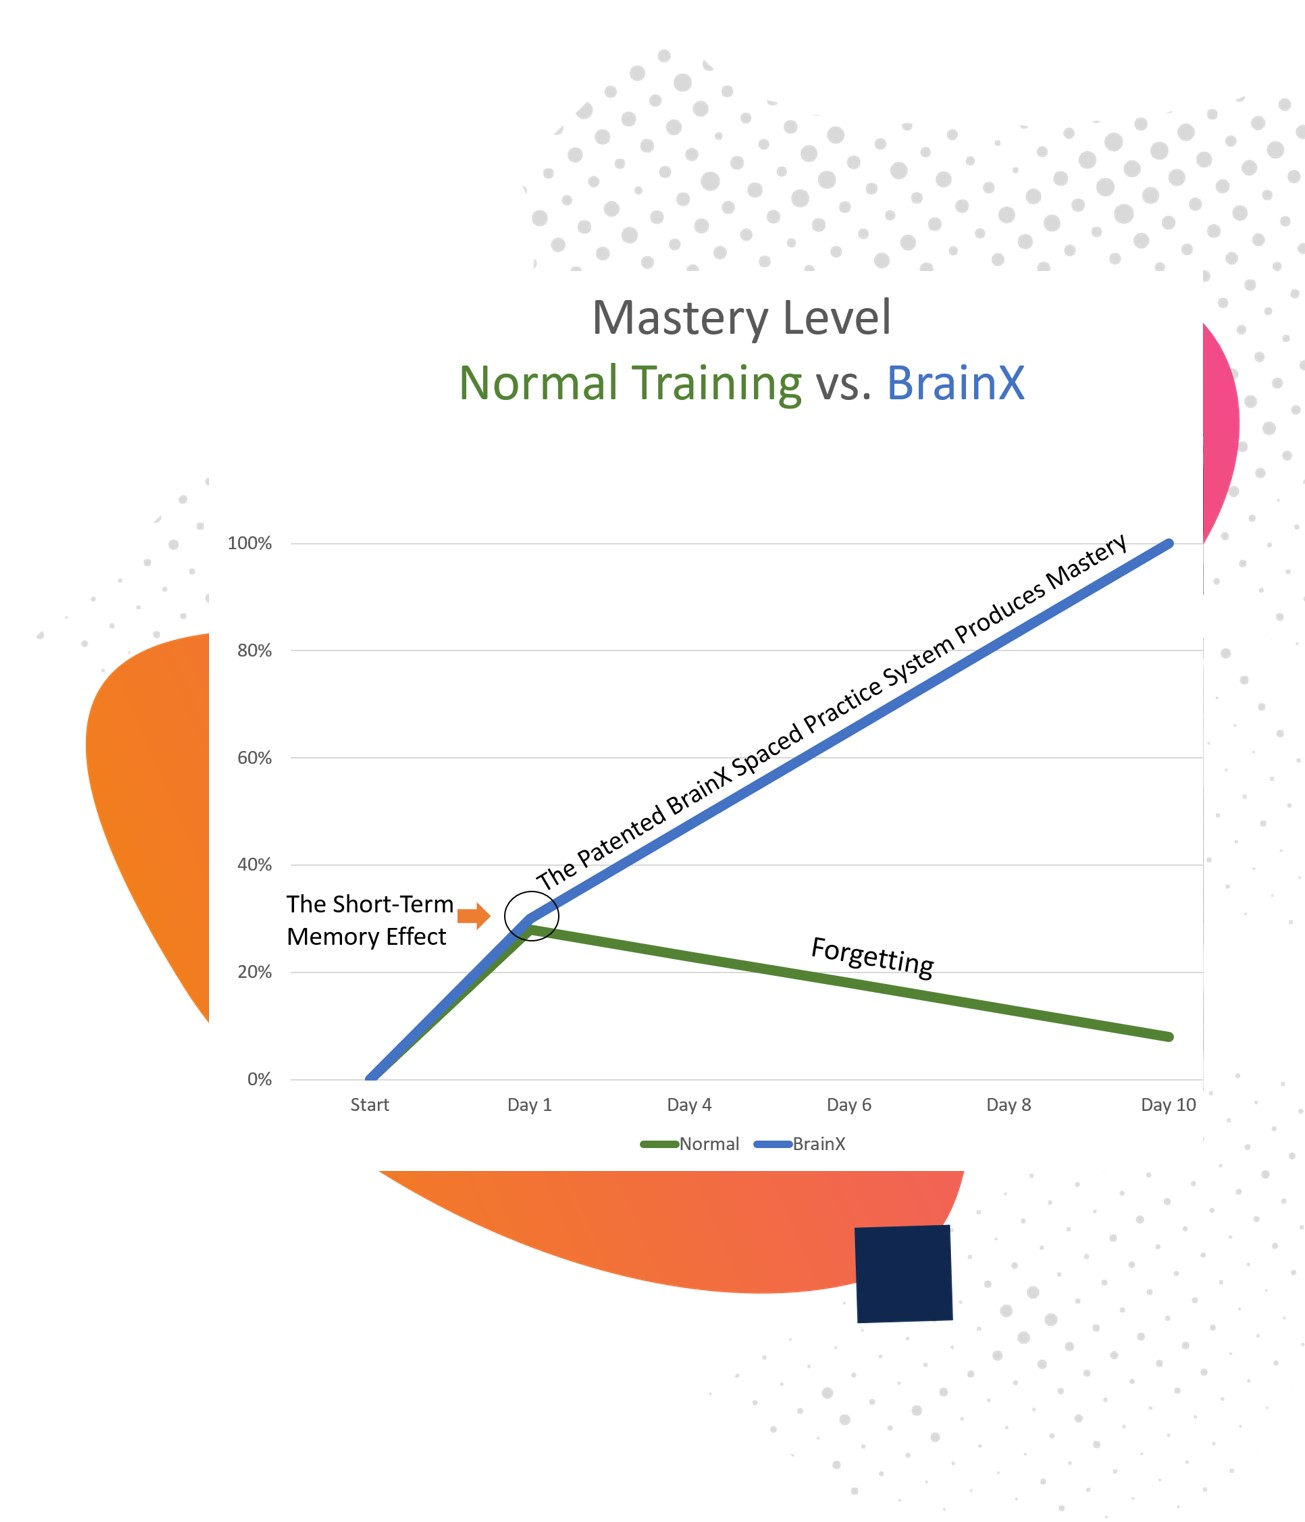 BrainX Mastery Level Chart